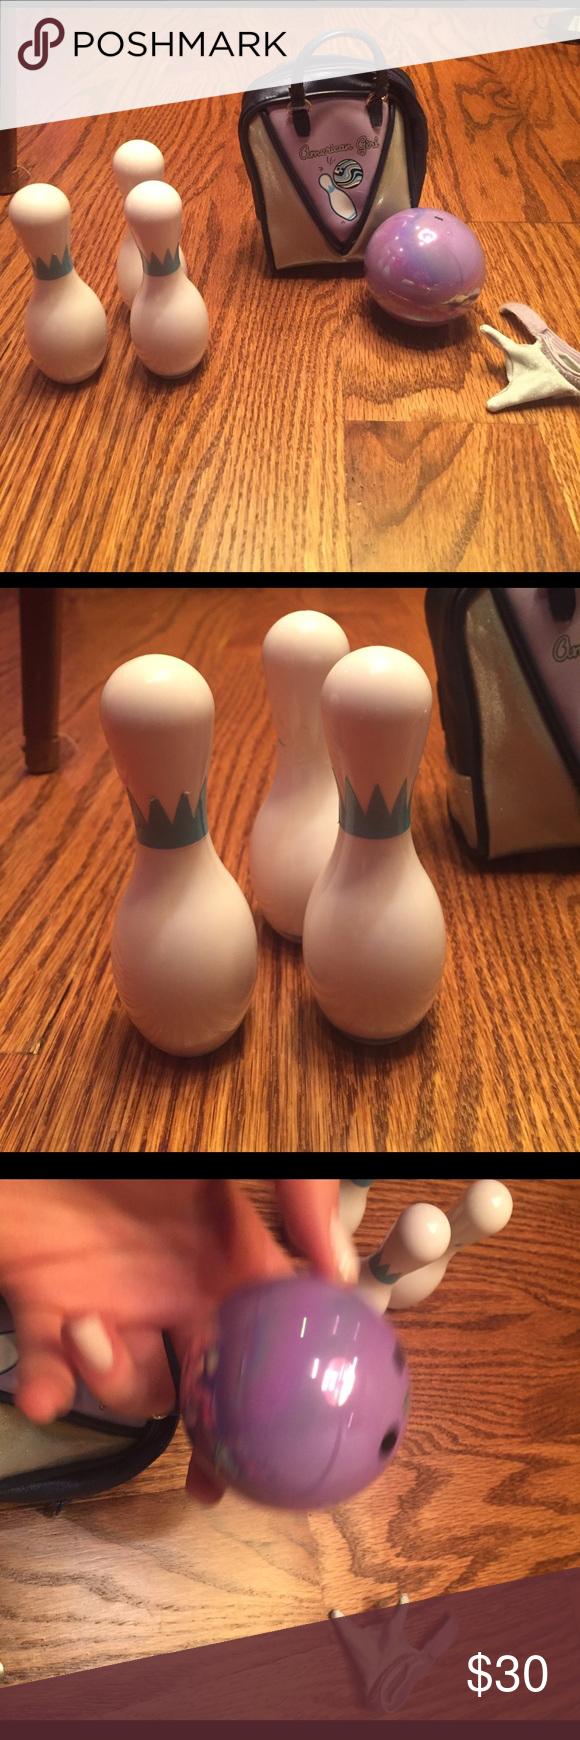 American Girl Bowling Set Bowling bag, three bowling pins